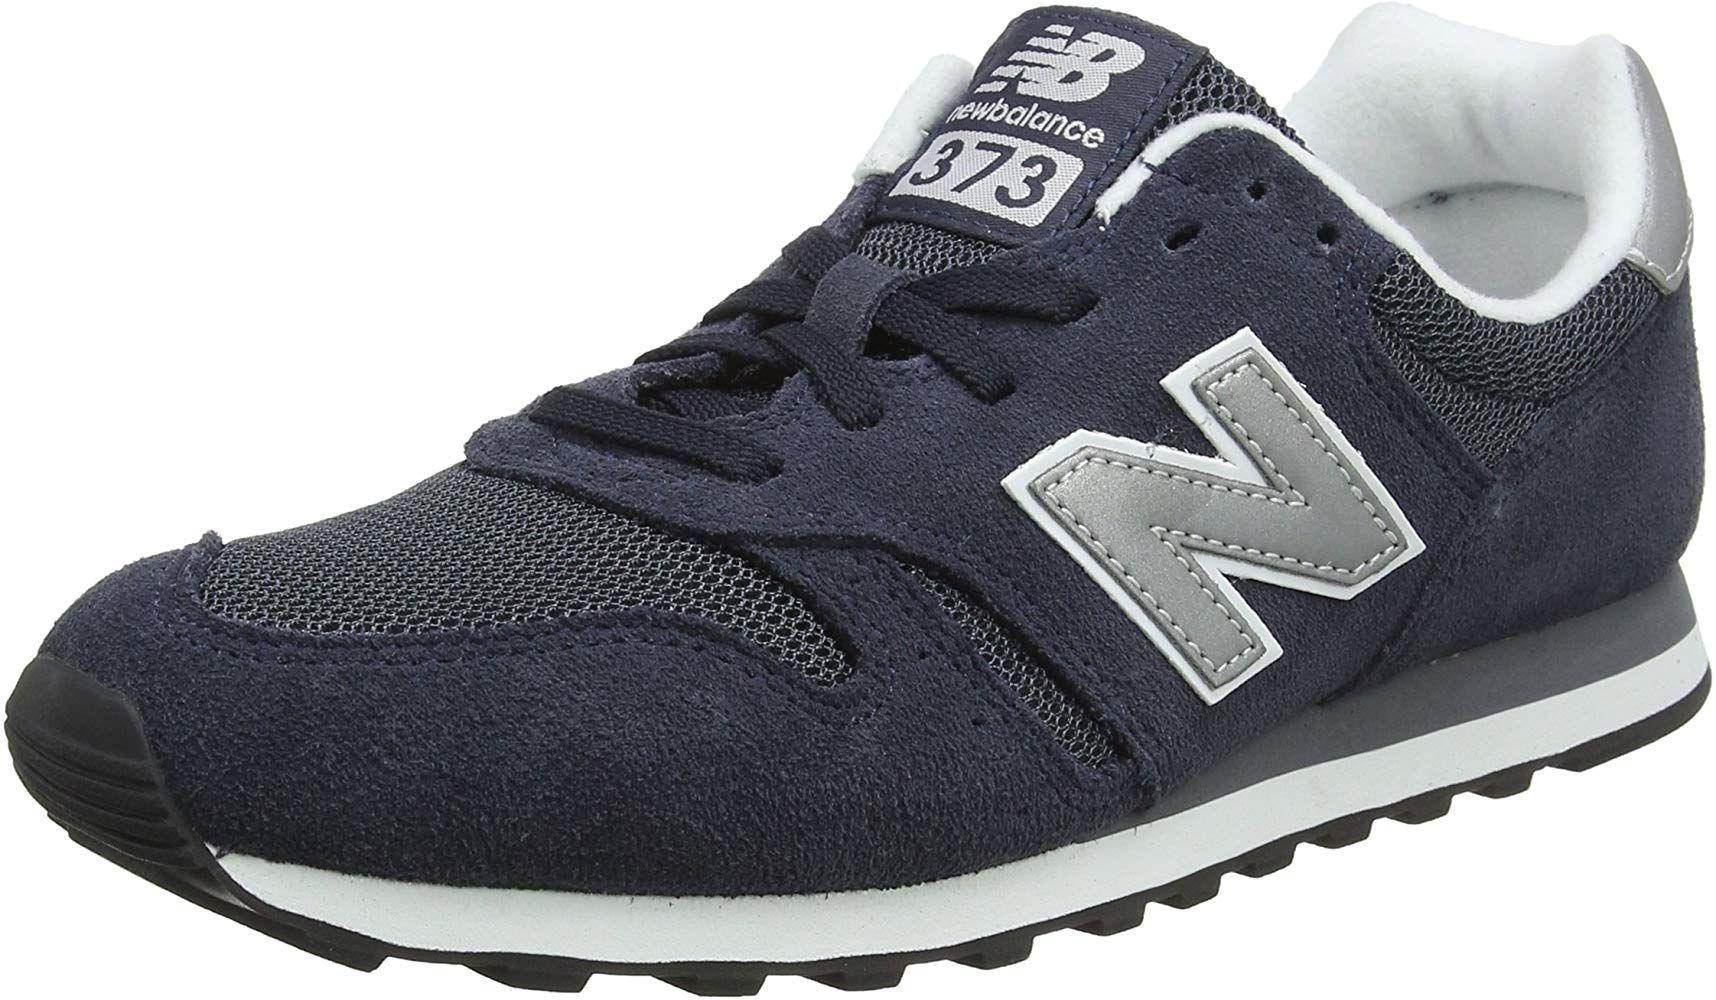 New Balance ML373 navy heren sneakers - diverse maten